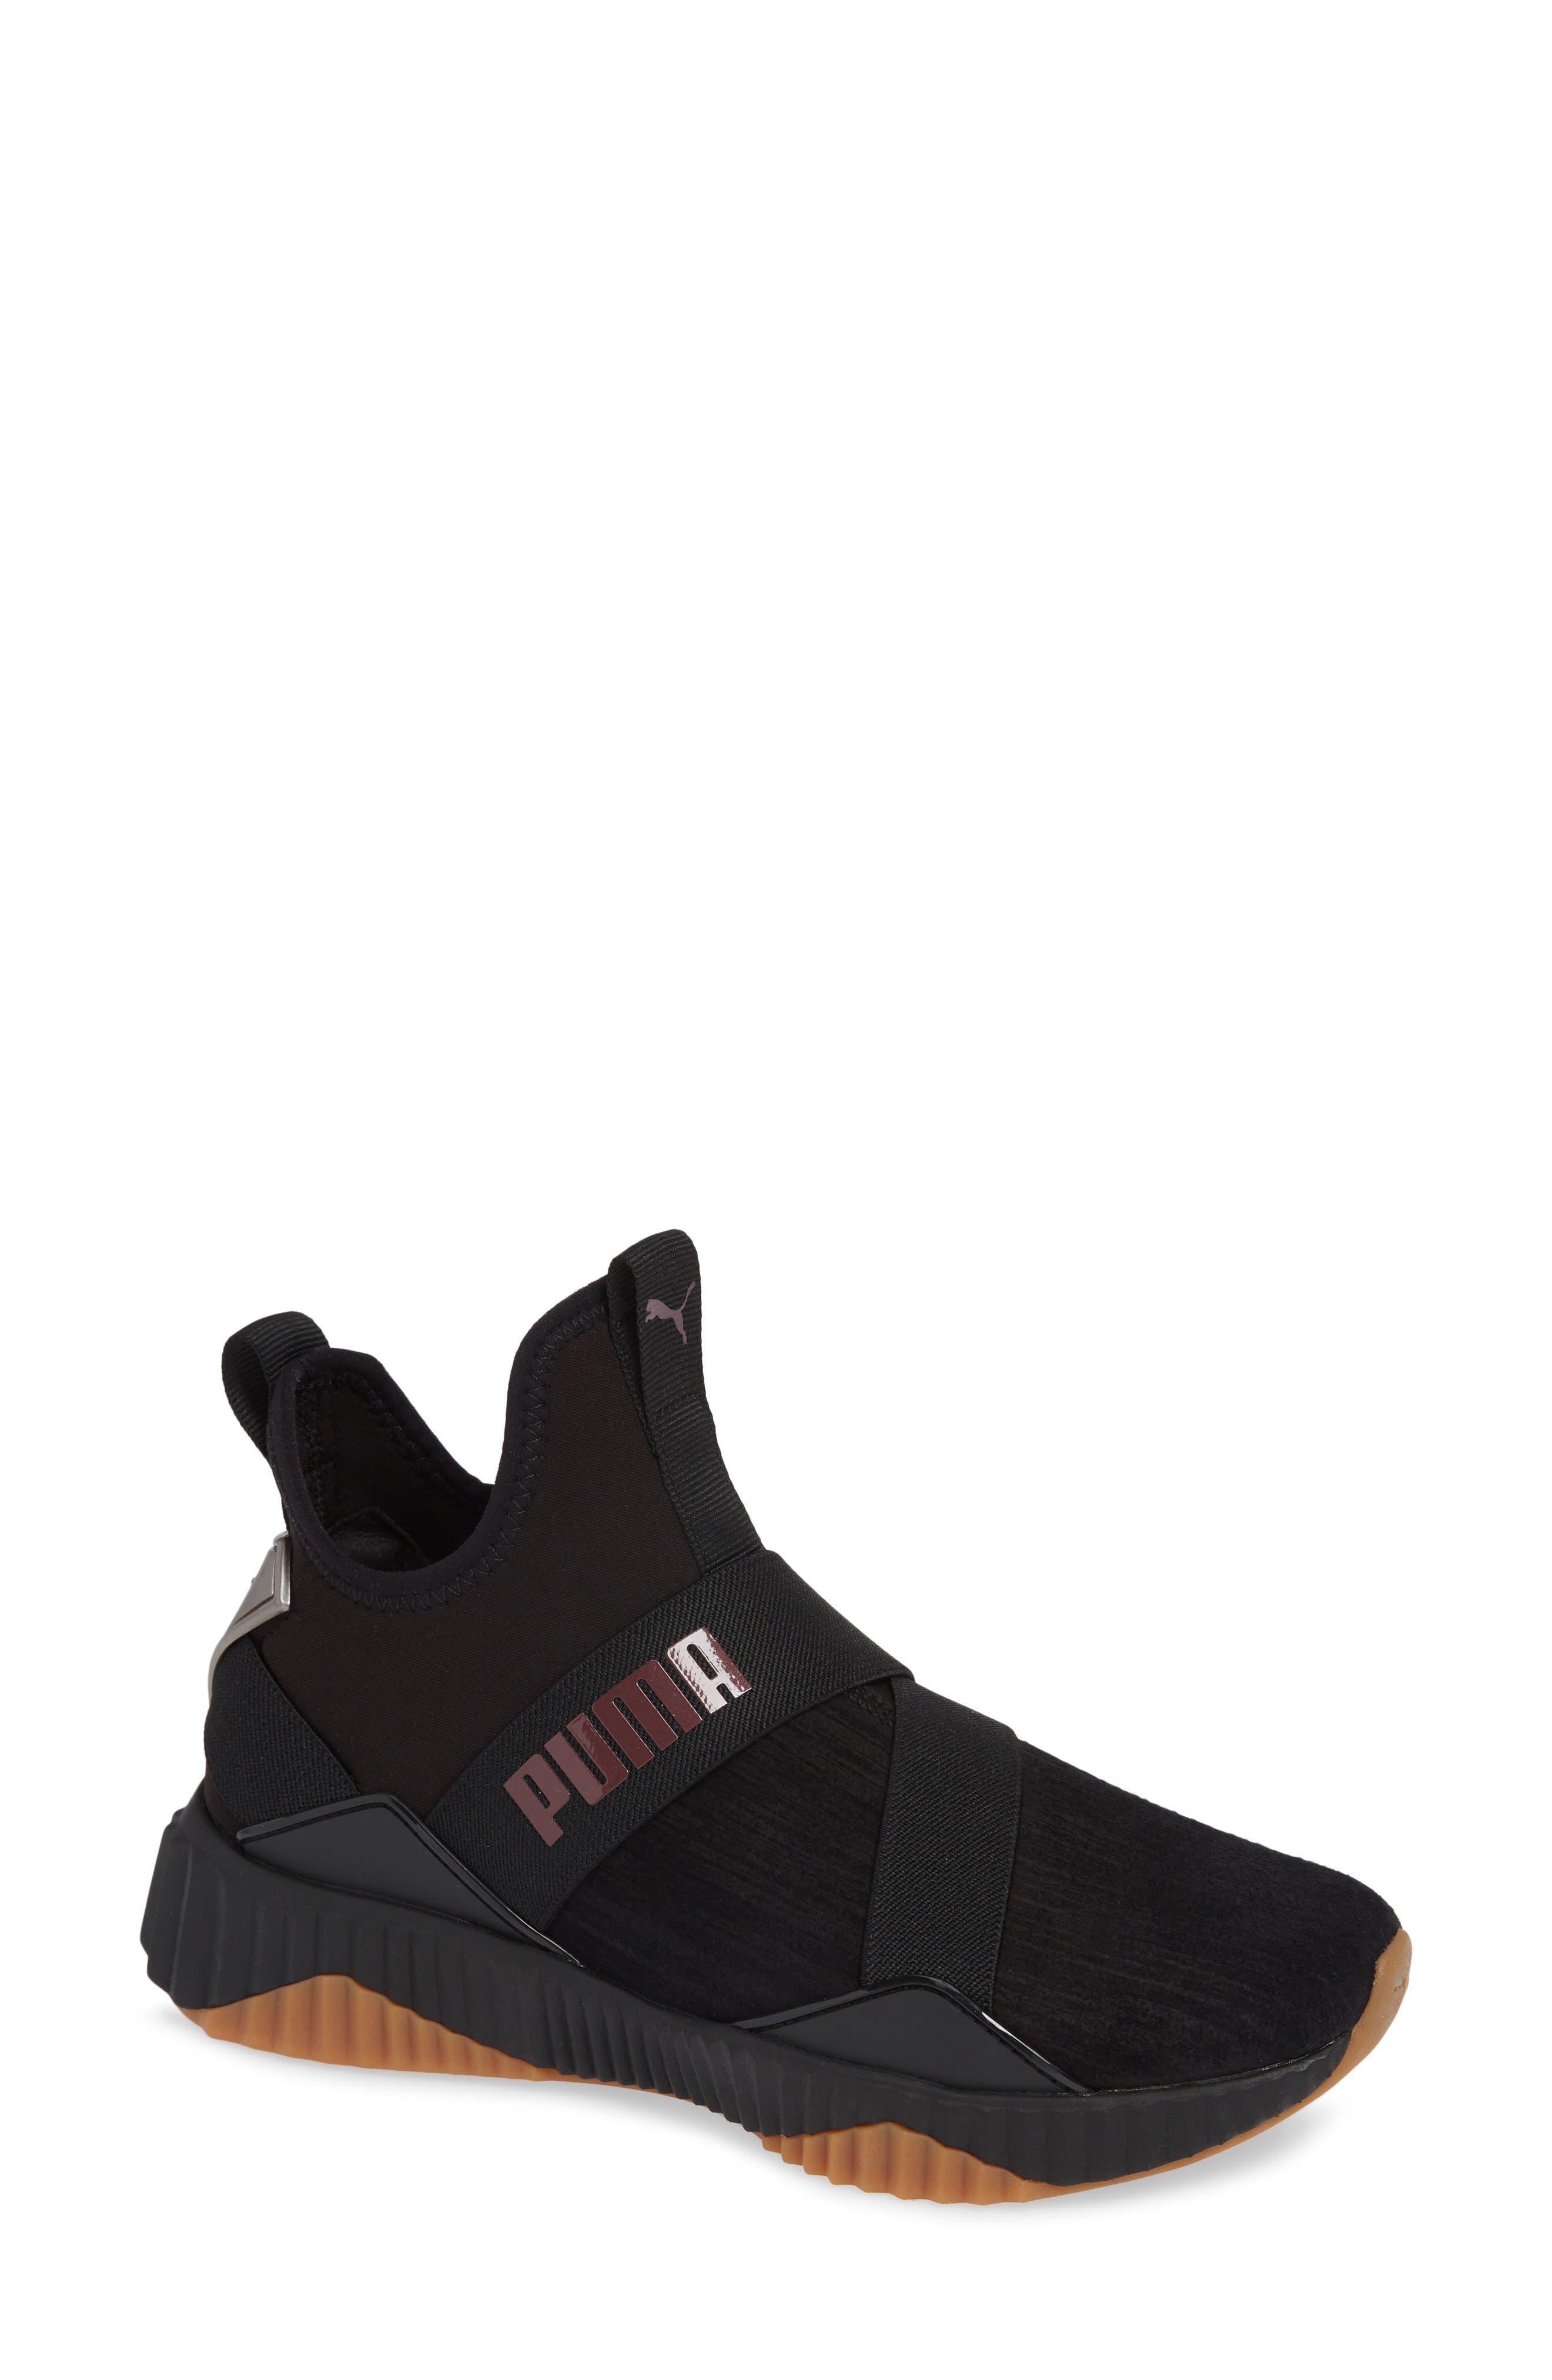 Defy Mid Luxe Sneaker,                         Main,                         color, PUMA BLACK/ FIG